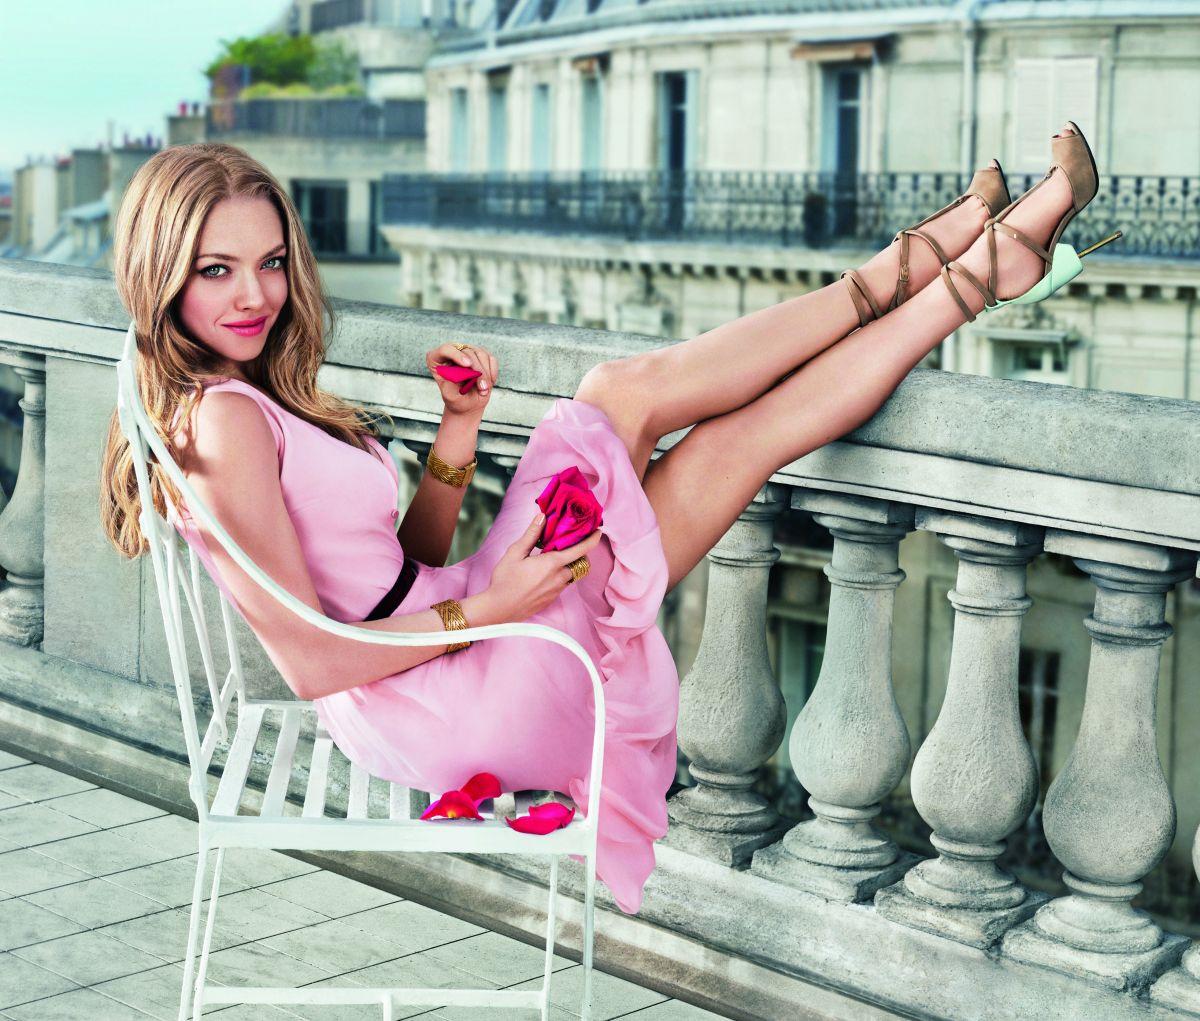 AMANA SEYFRIED - 2015 Givenchy Live Irresistible Fragrance Promos